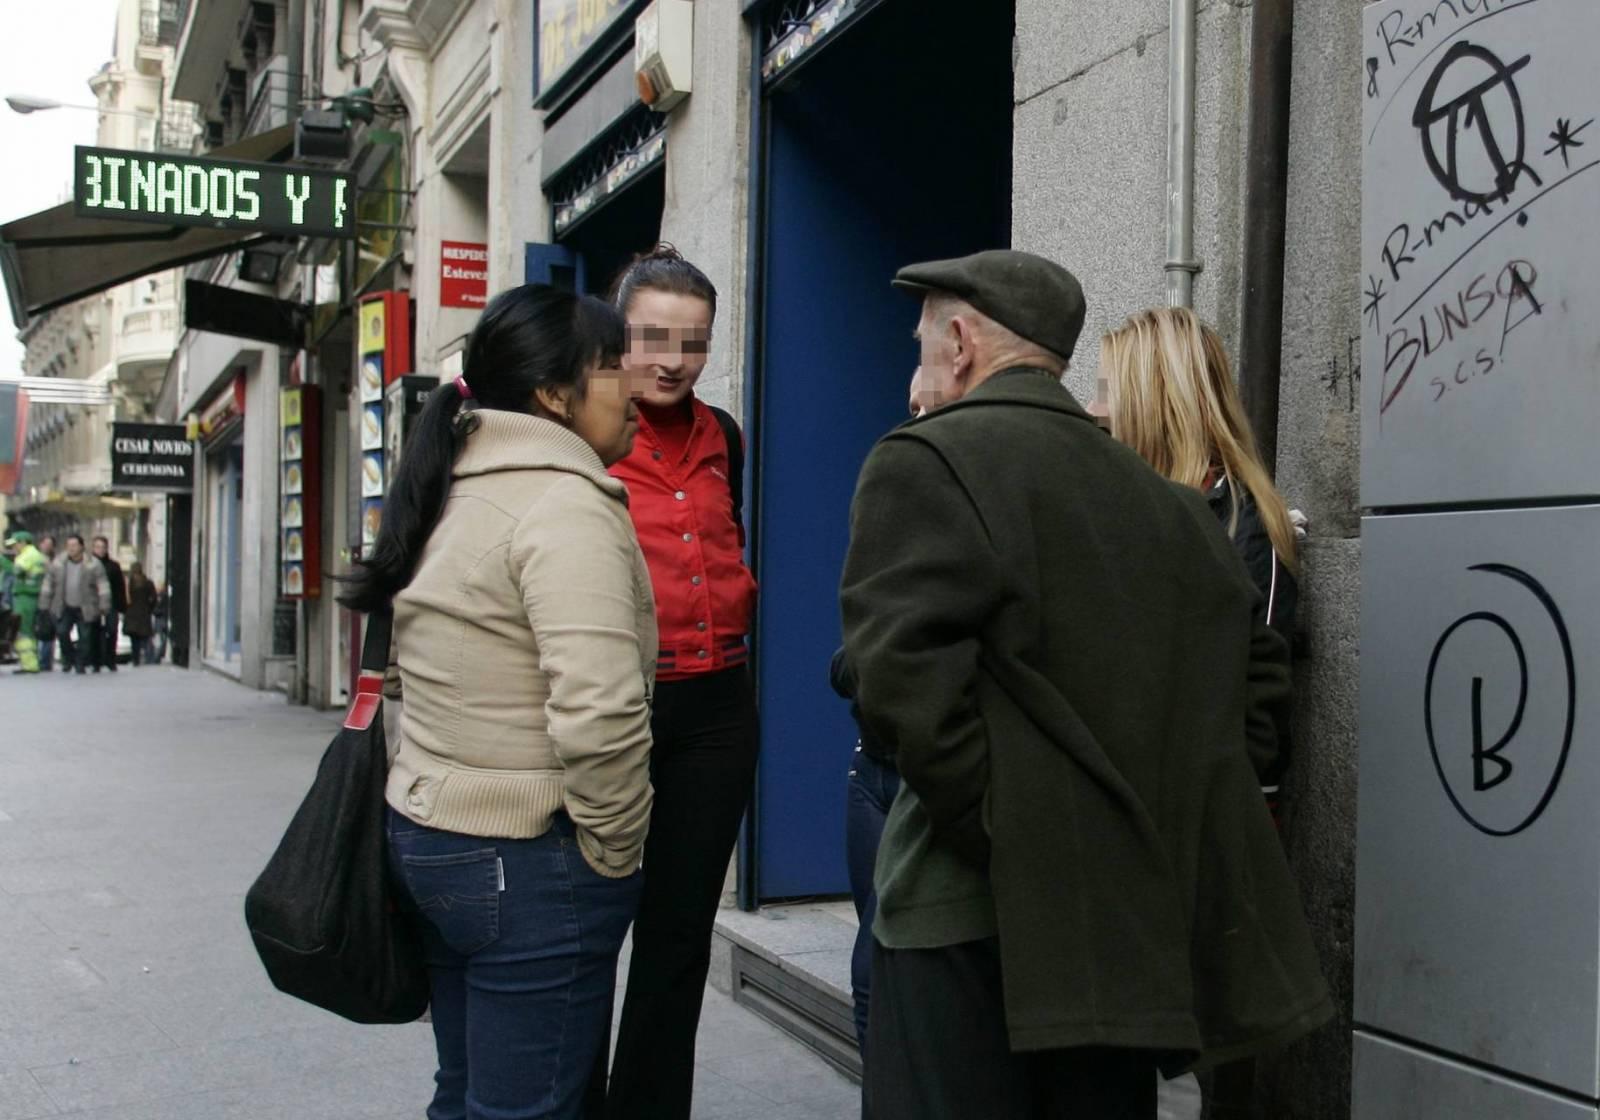 Scorts gordita economico en Lanús-5418